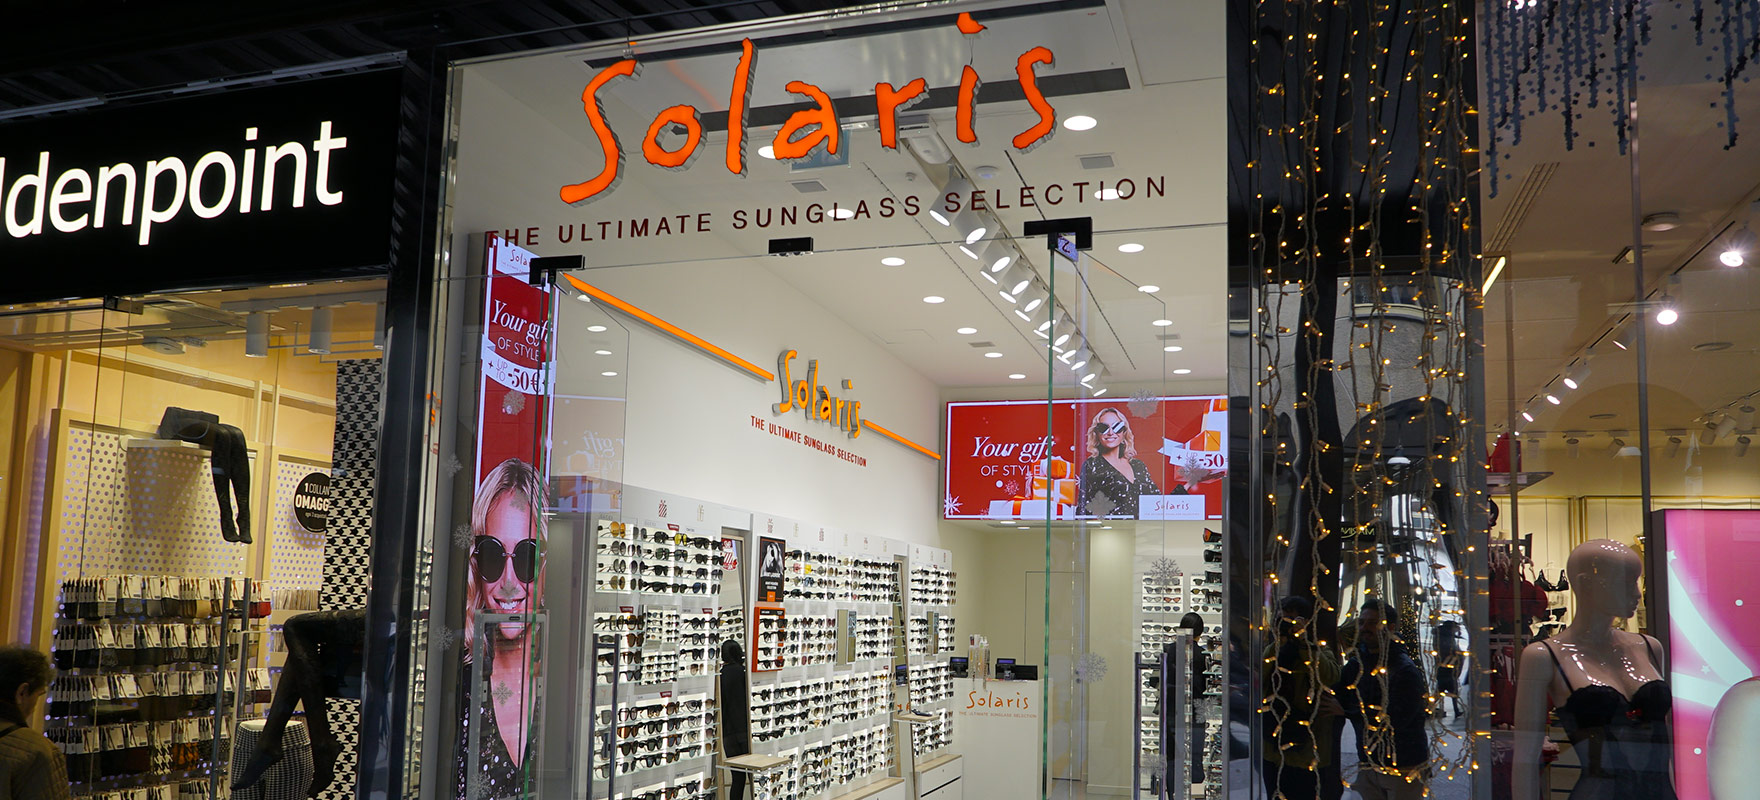 Ledwall indoor Solaris Schermo led da interni fondo store retrocassa banner digitali lato vetrina